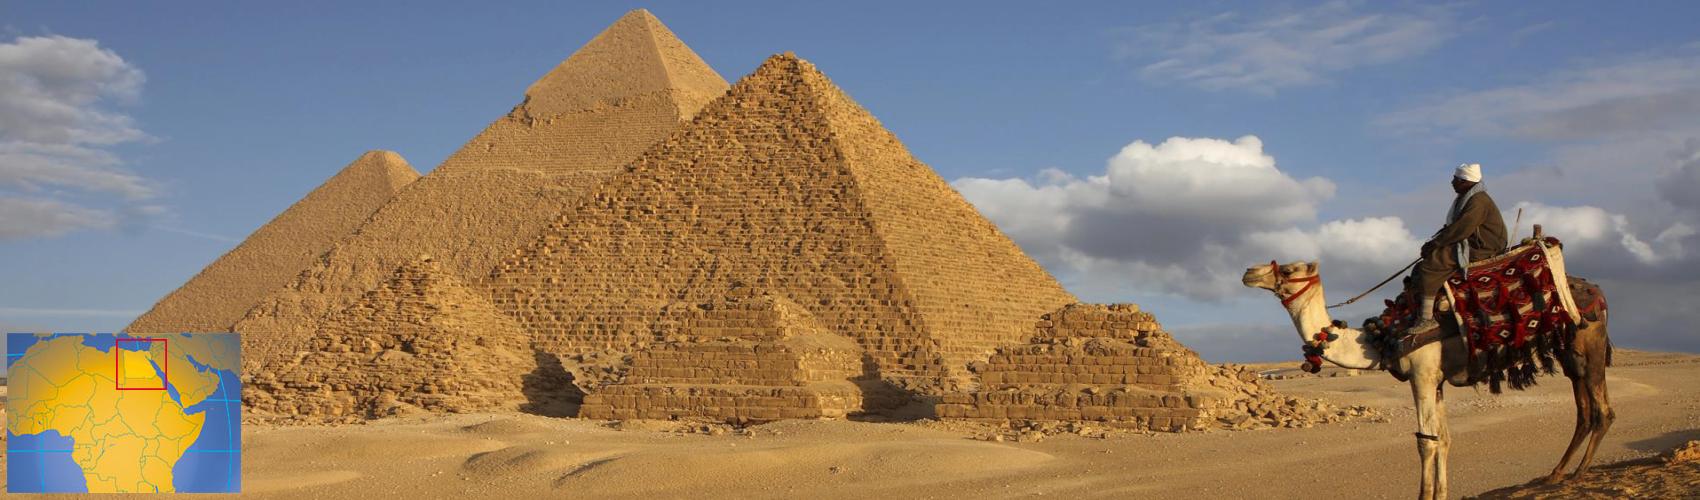 NL-GESPROKEN // EGYPTE